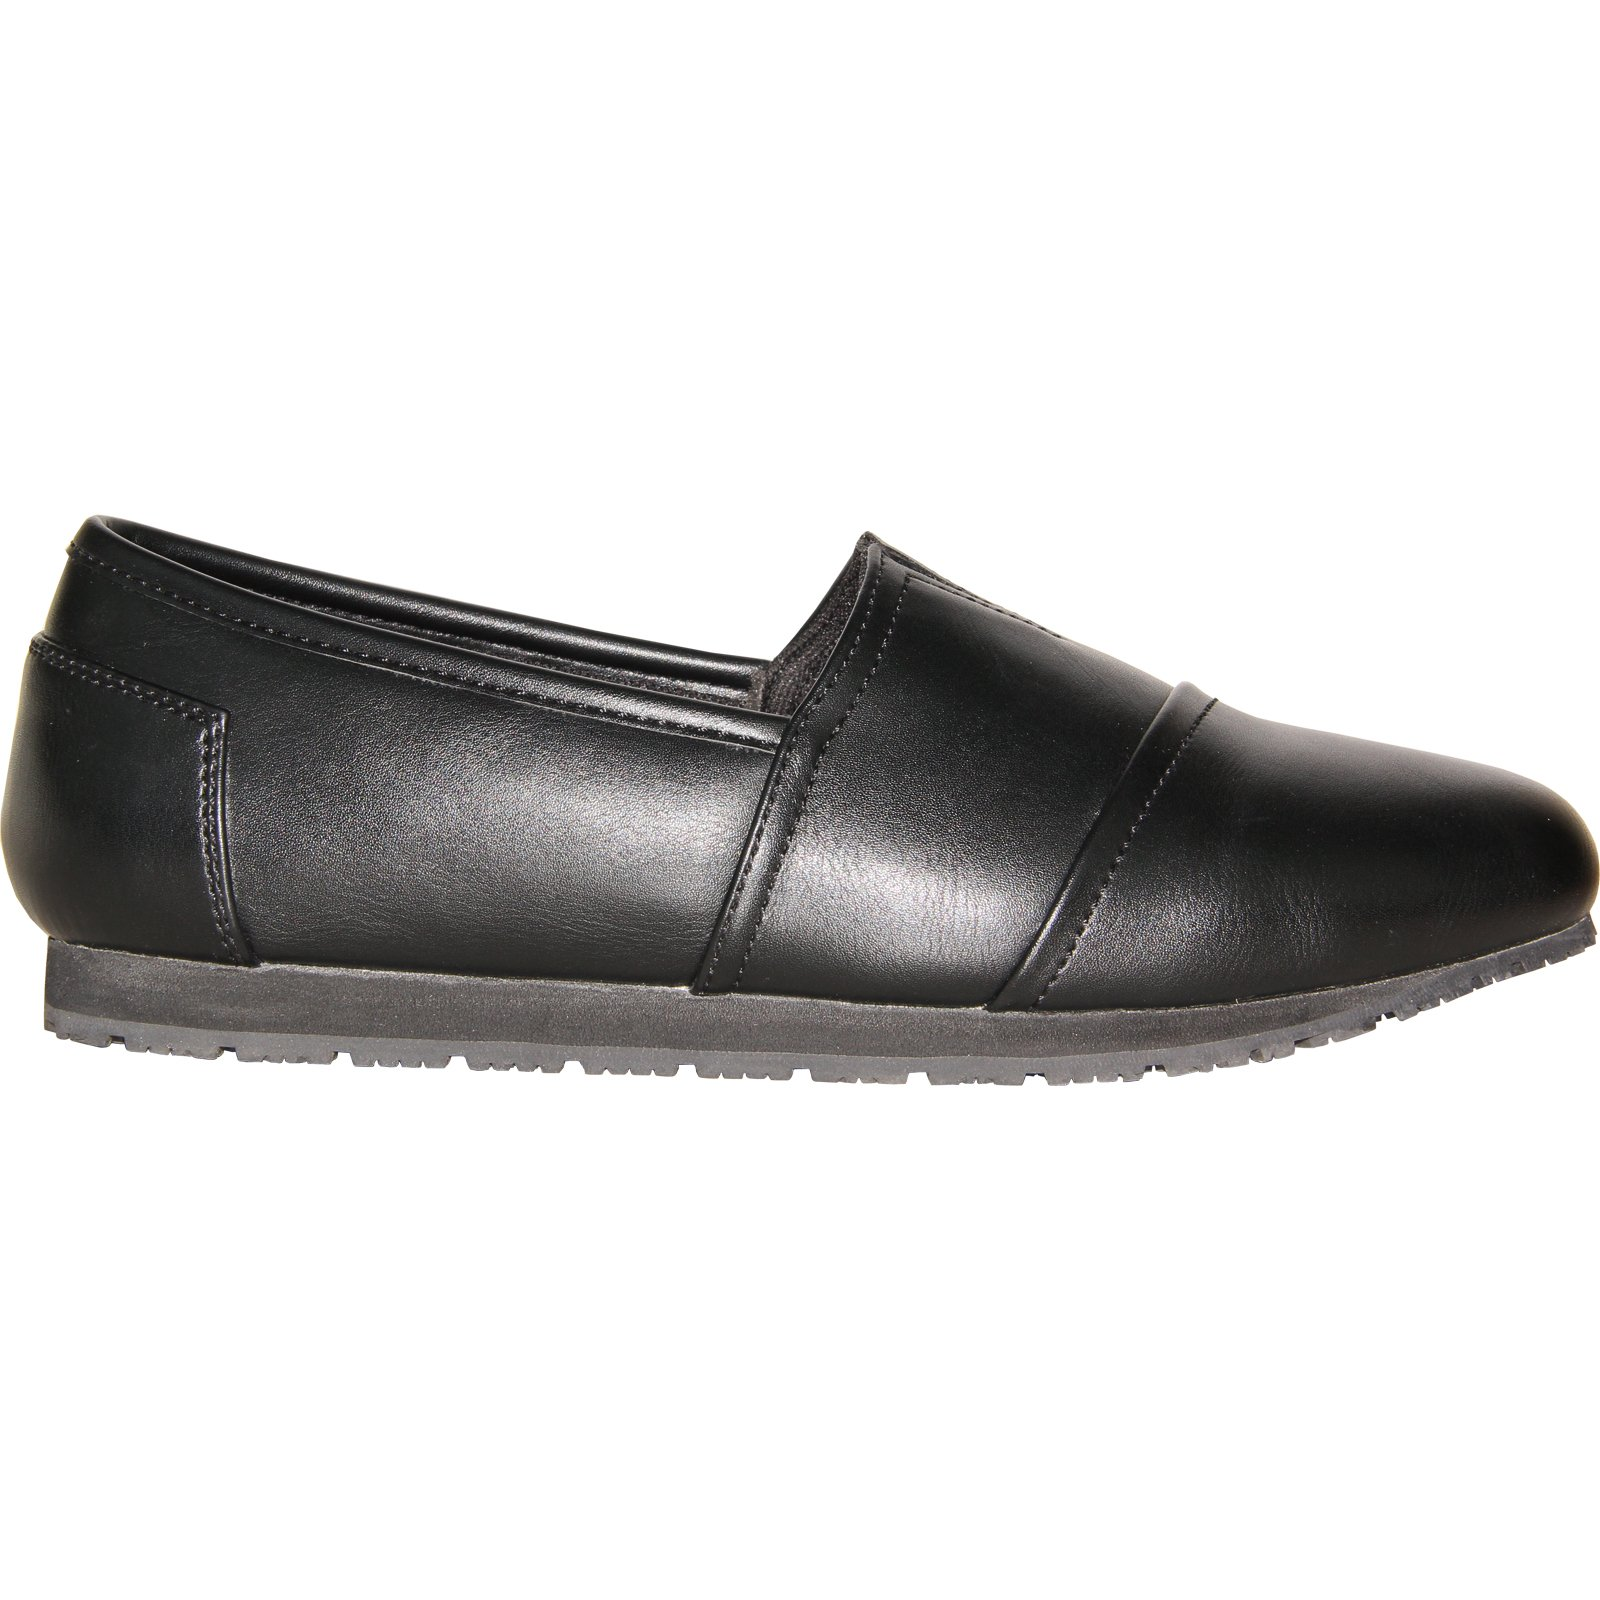 VANGELO Professional Slip Resistant Women Work Shoe Isana Black by VANGELO (Image #4)